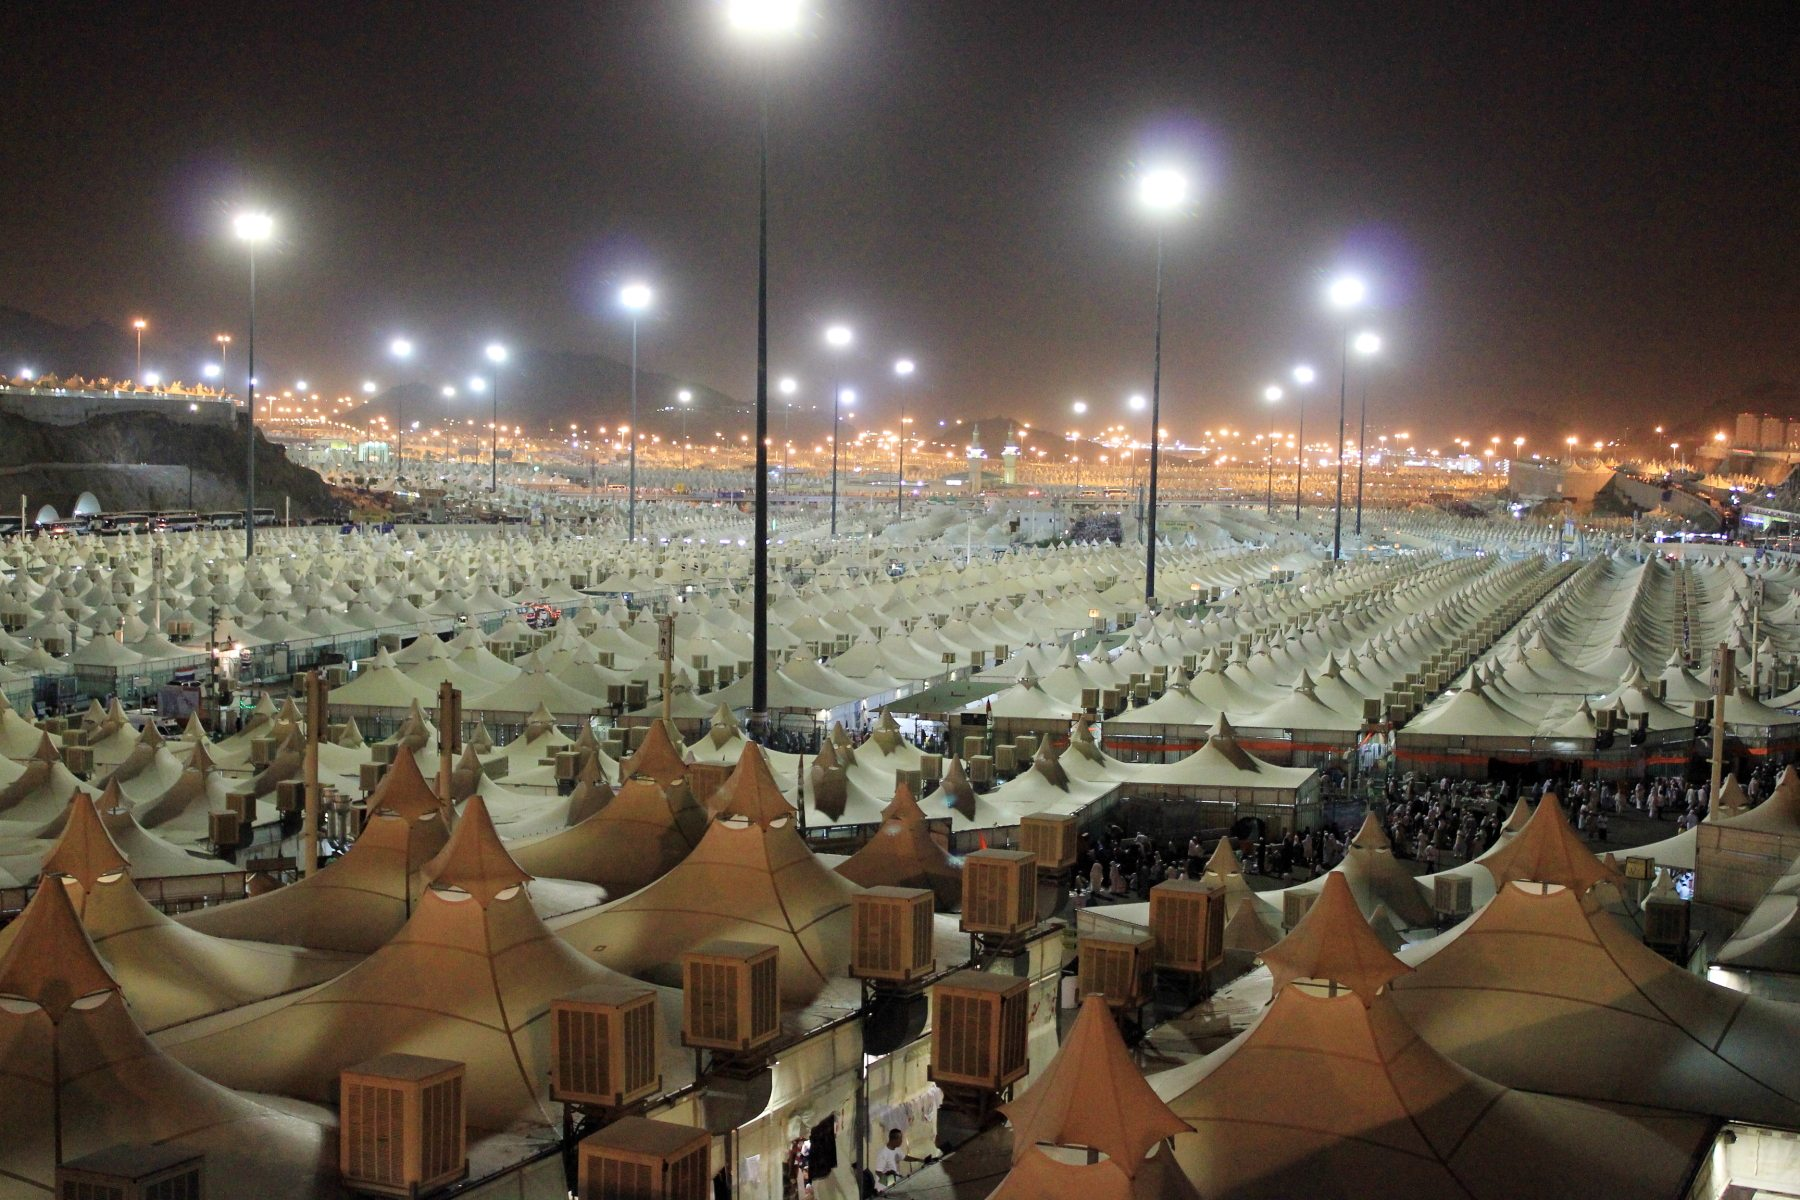 Mina, Tent city